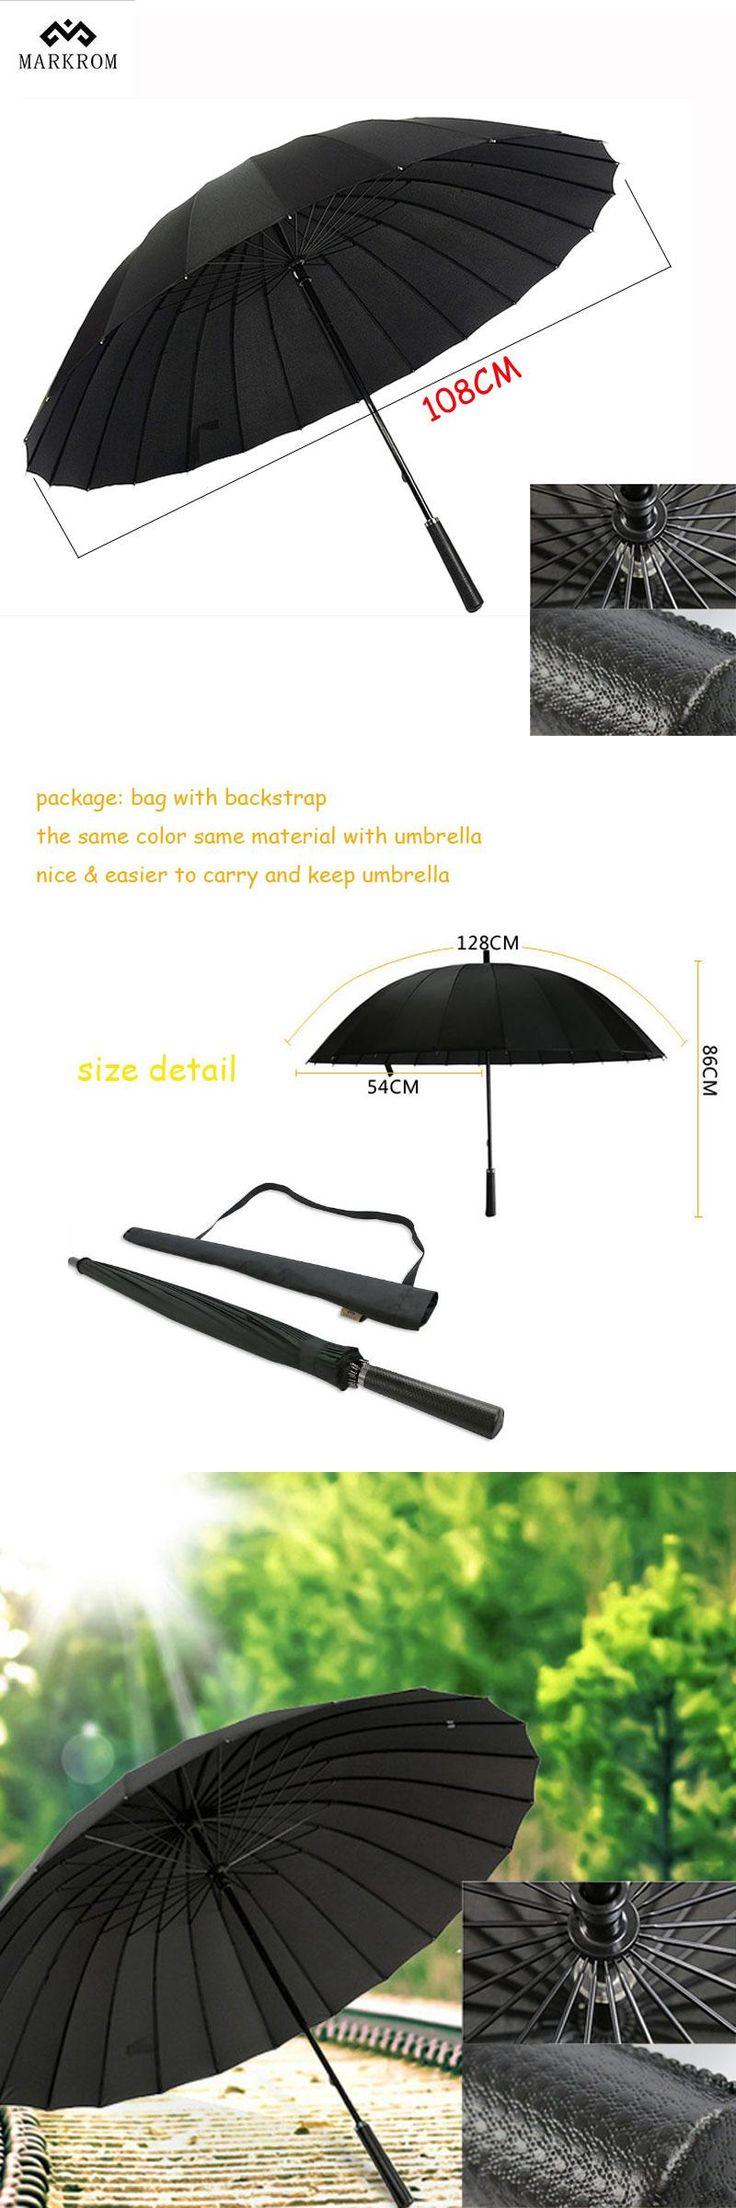 Best 25 Large outdoor umbrella ideas on Pinterest Deck umbrella